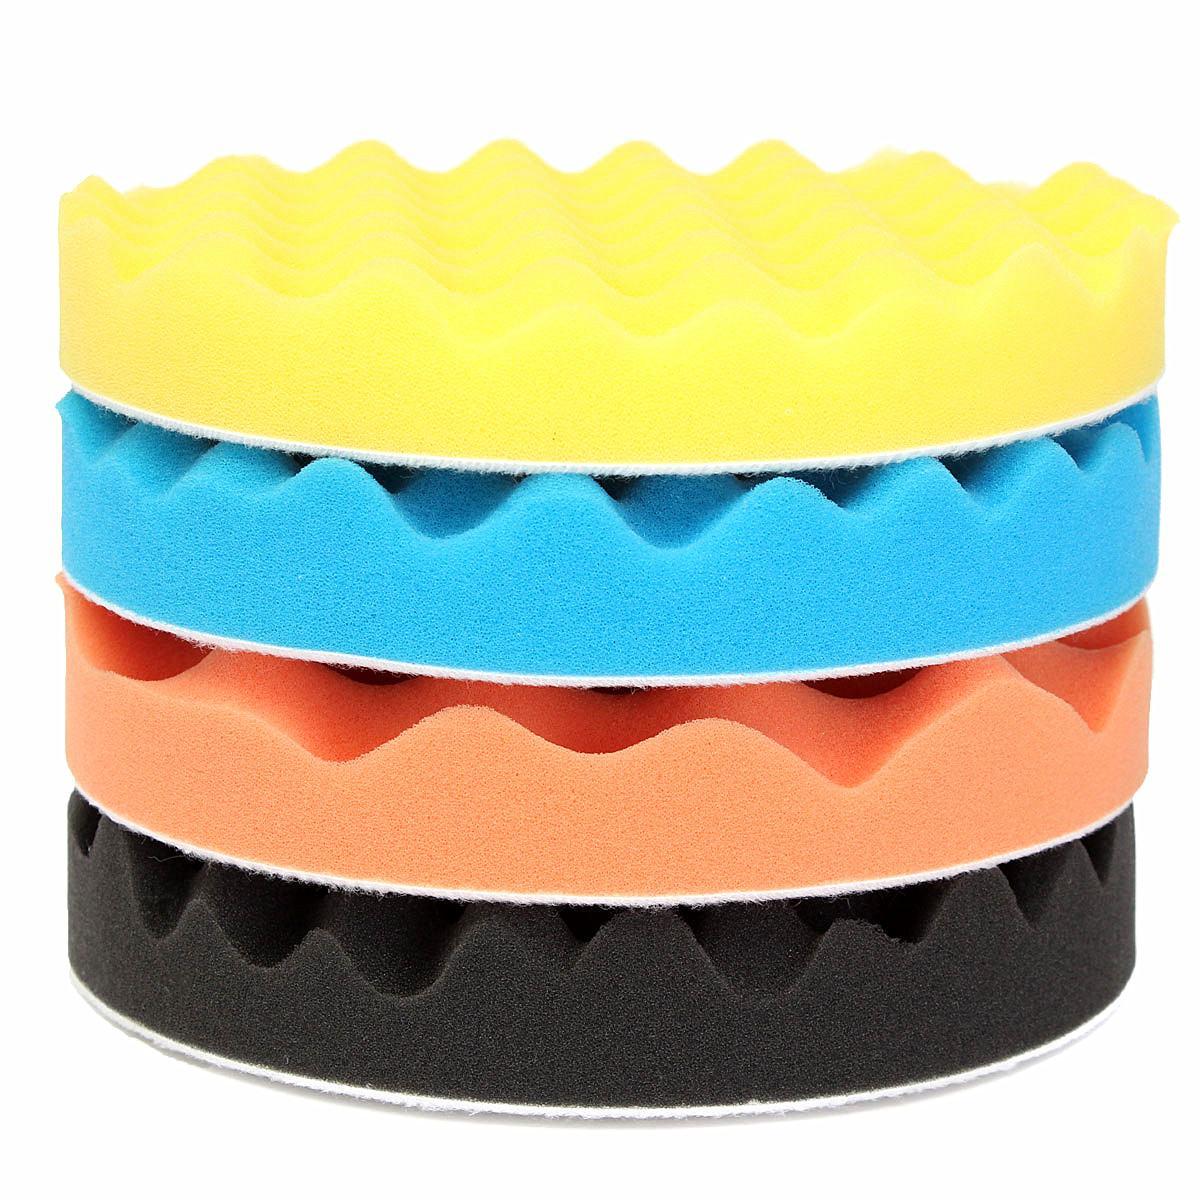 4Pcs 7''/180mm Sponge Polishing Buffer Pad Waffle Foam Tool Kit For Car Polisher